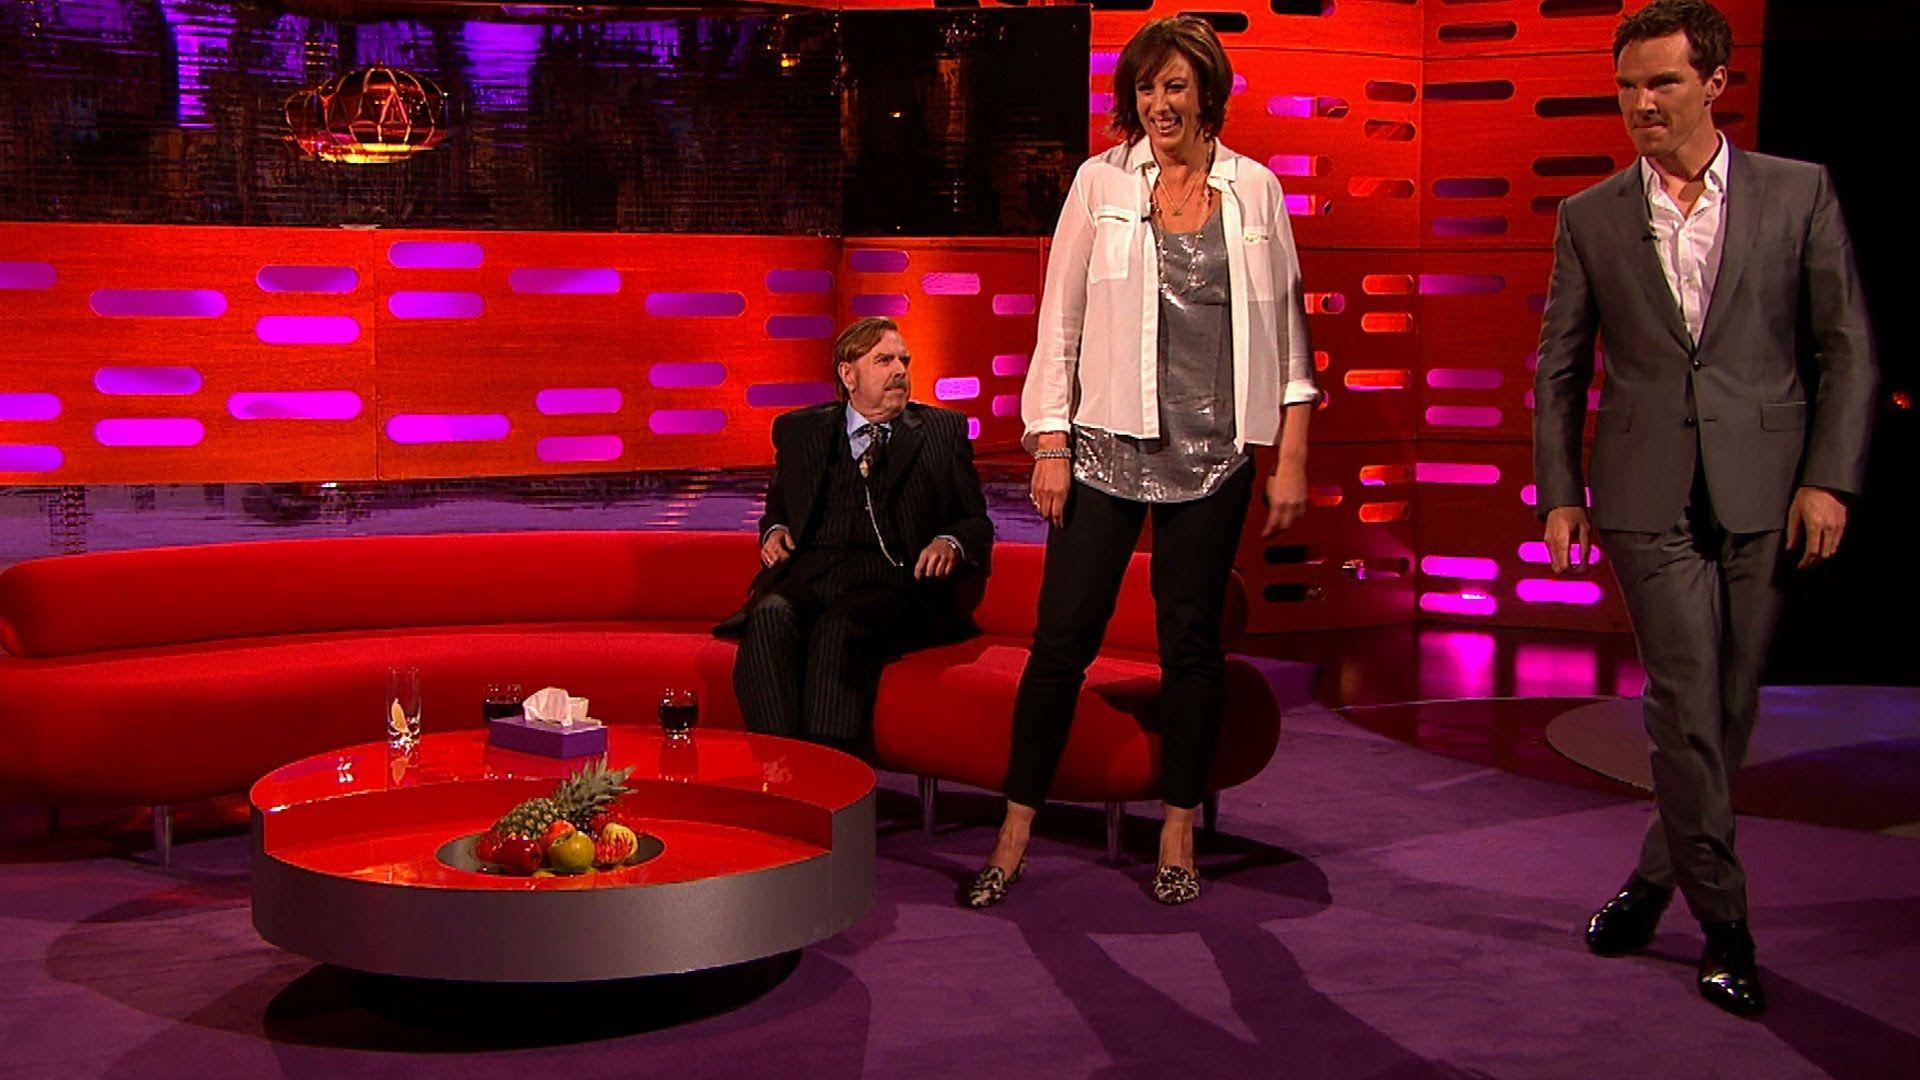 Miranda Benedict Cumberbatch Demo A Pop Star Walk The Graham